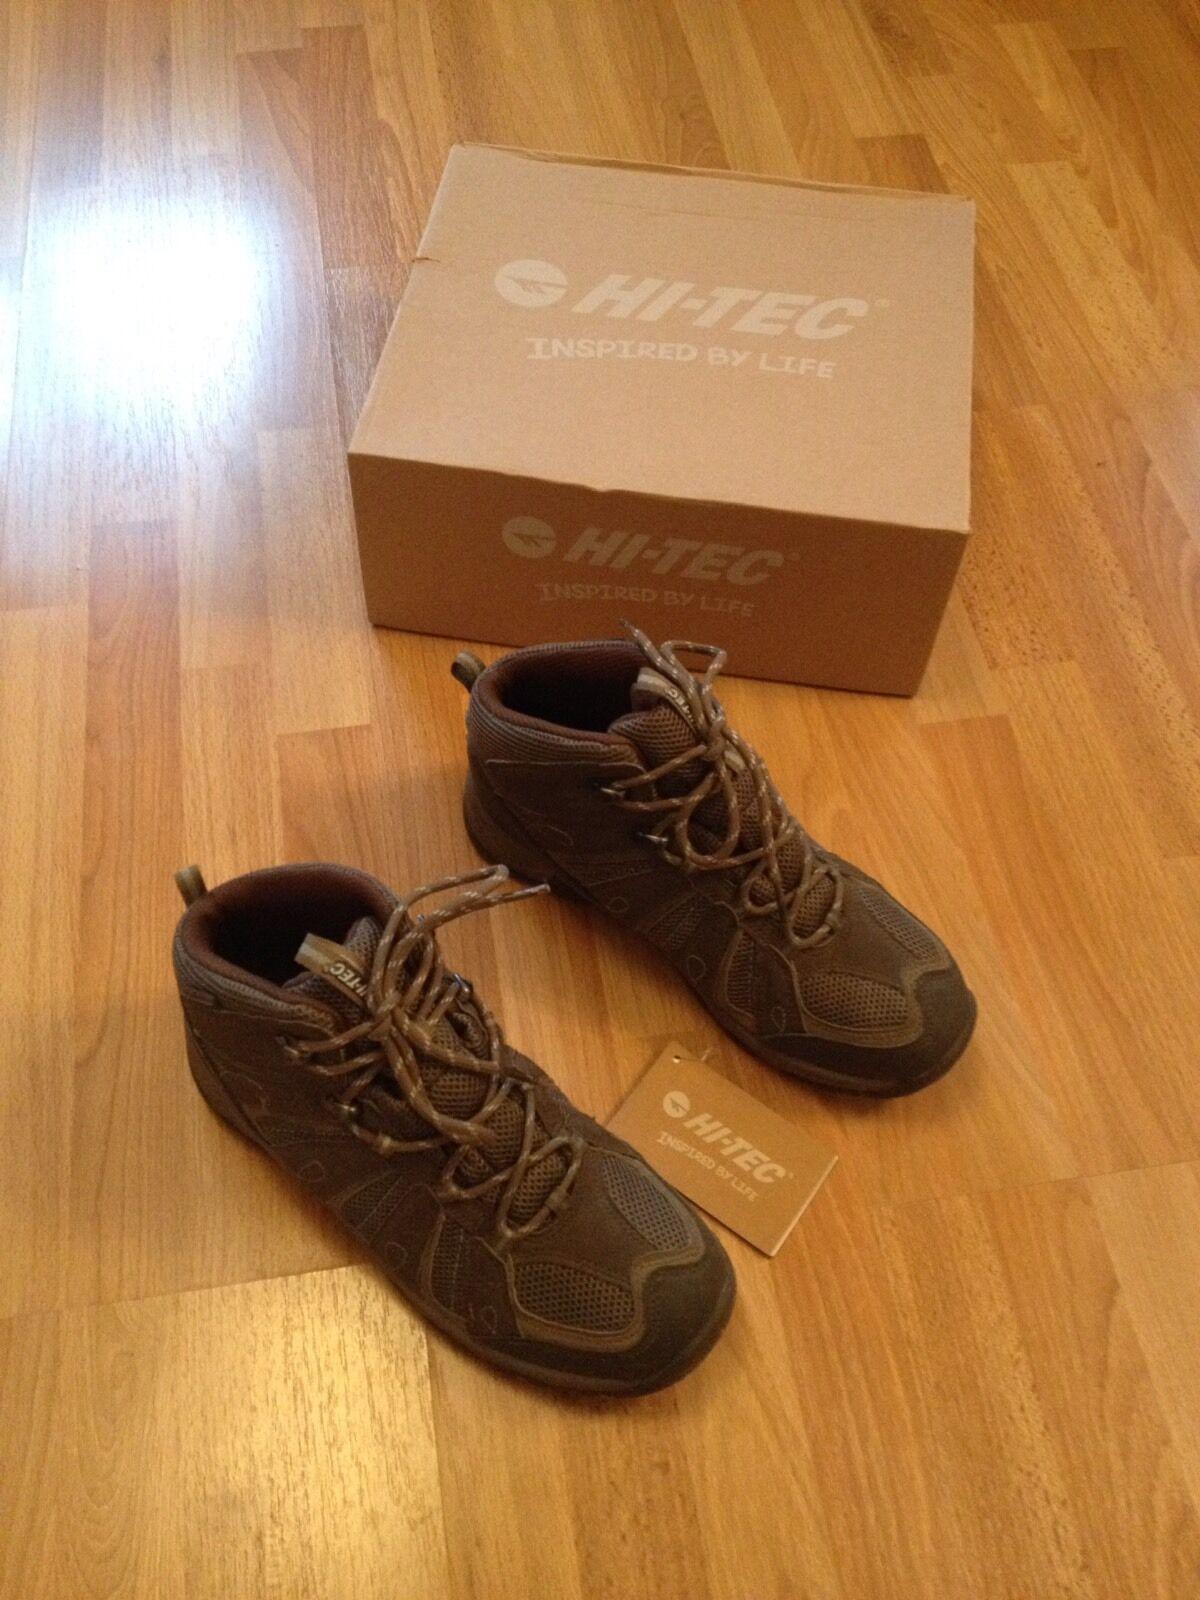 H by Hudson Tan Emmett Suede Leather Cuban Elastic Elastic Cuban Ankle Biker Boots 5 38 51f0b5